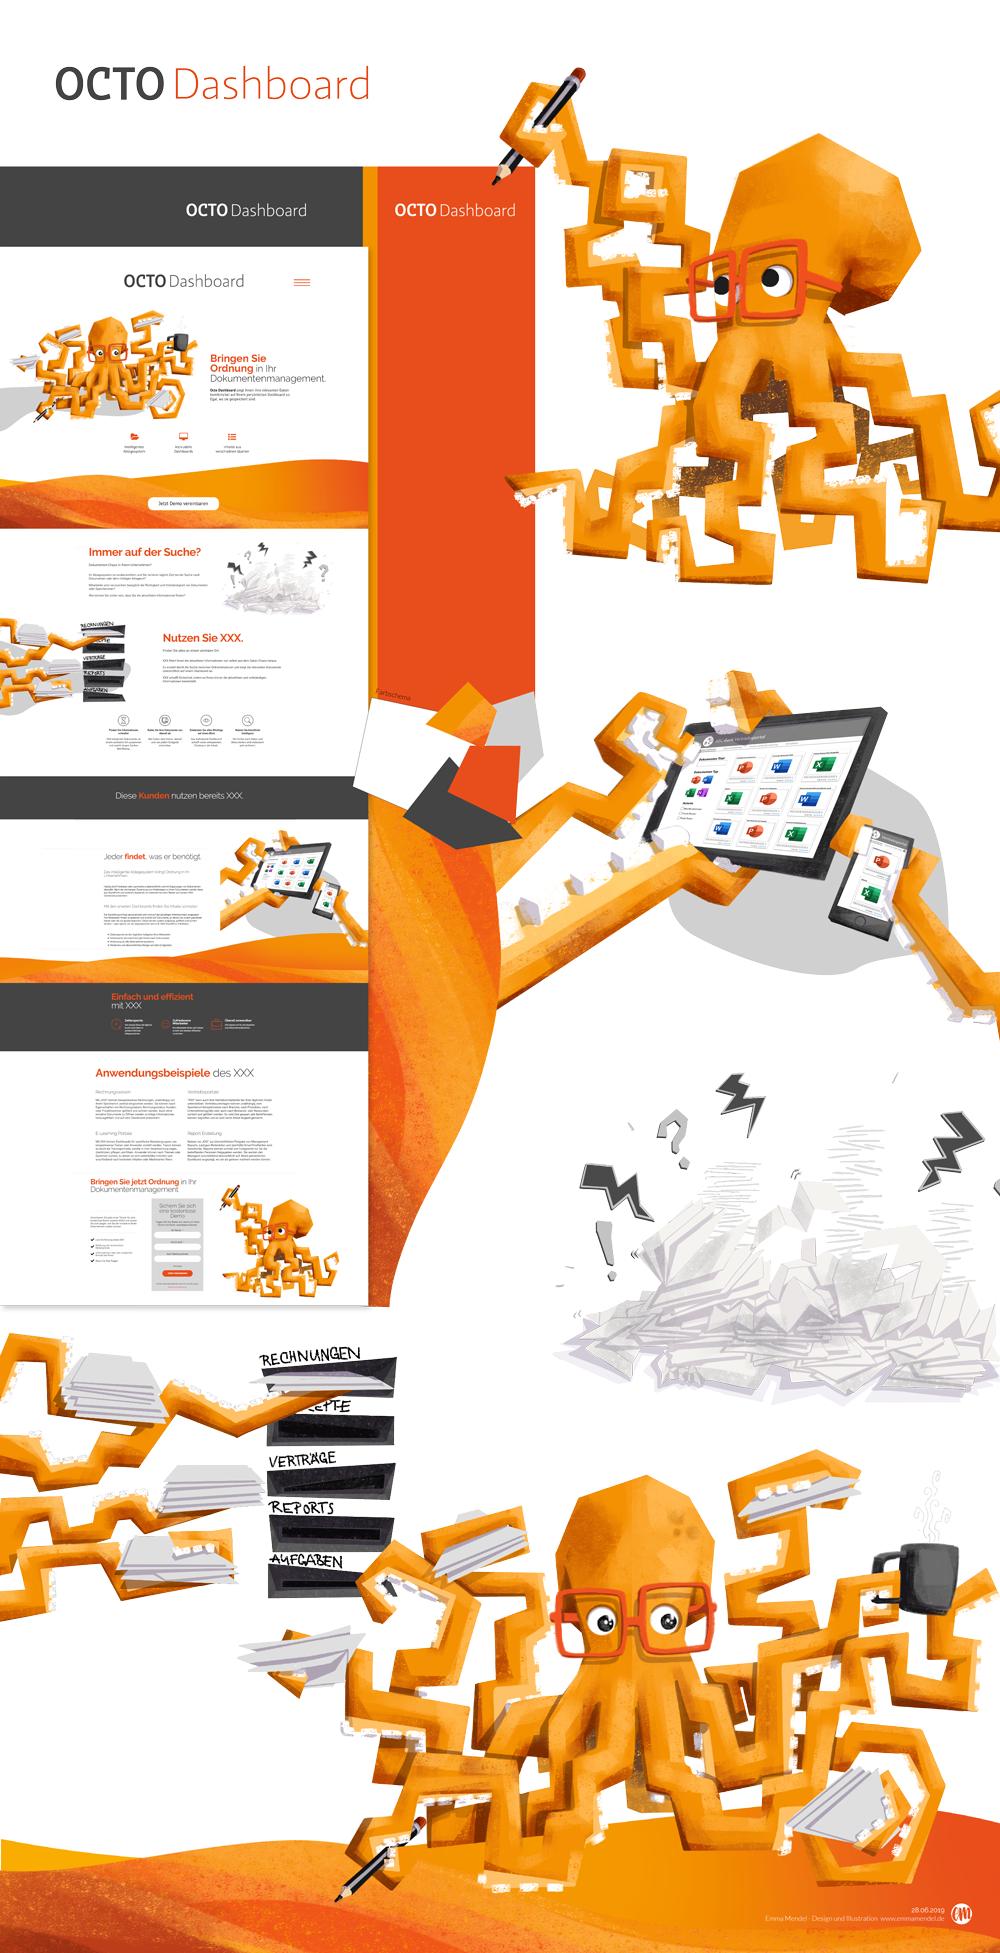 Produktdesign octo dashboard illustration oktopus orange landingpage